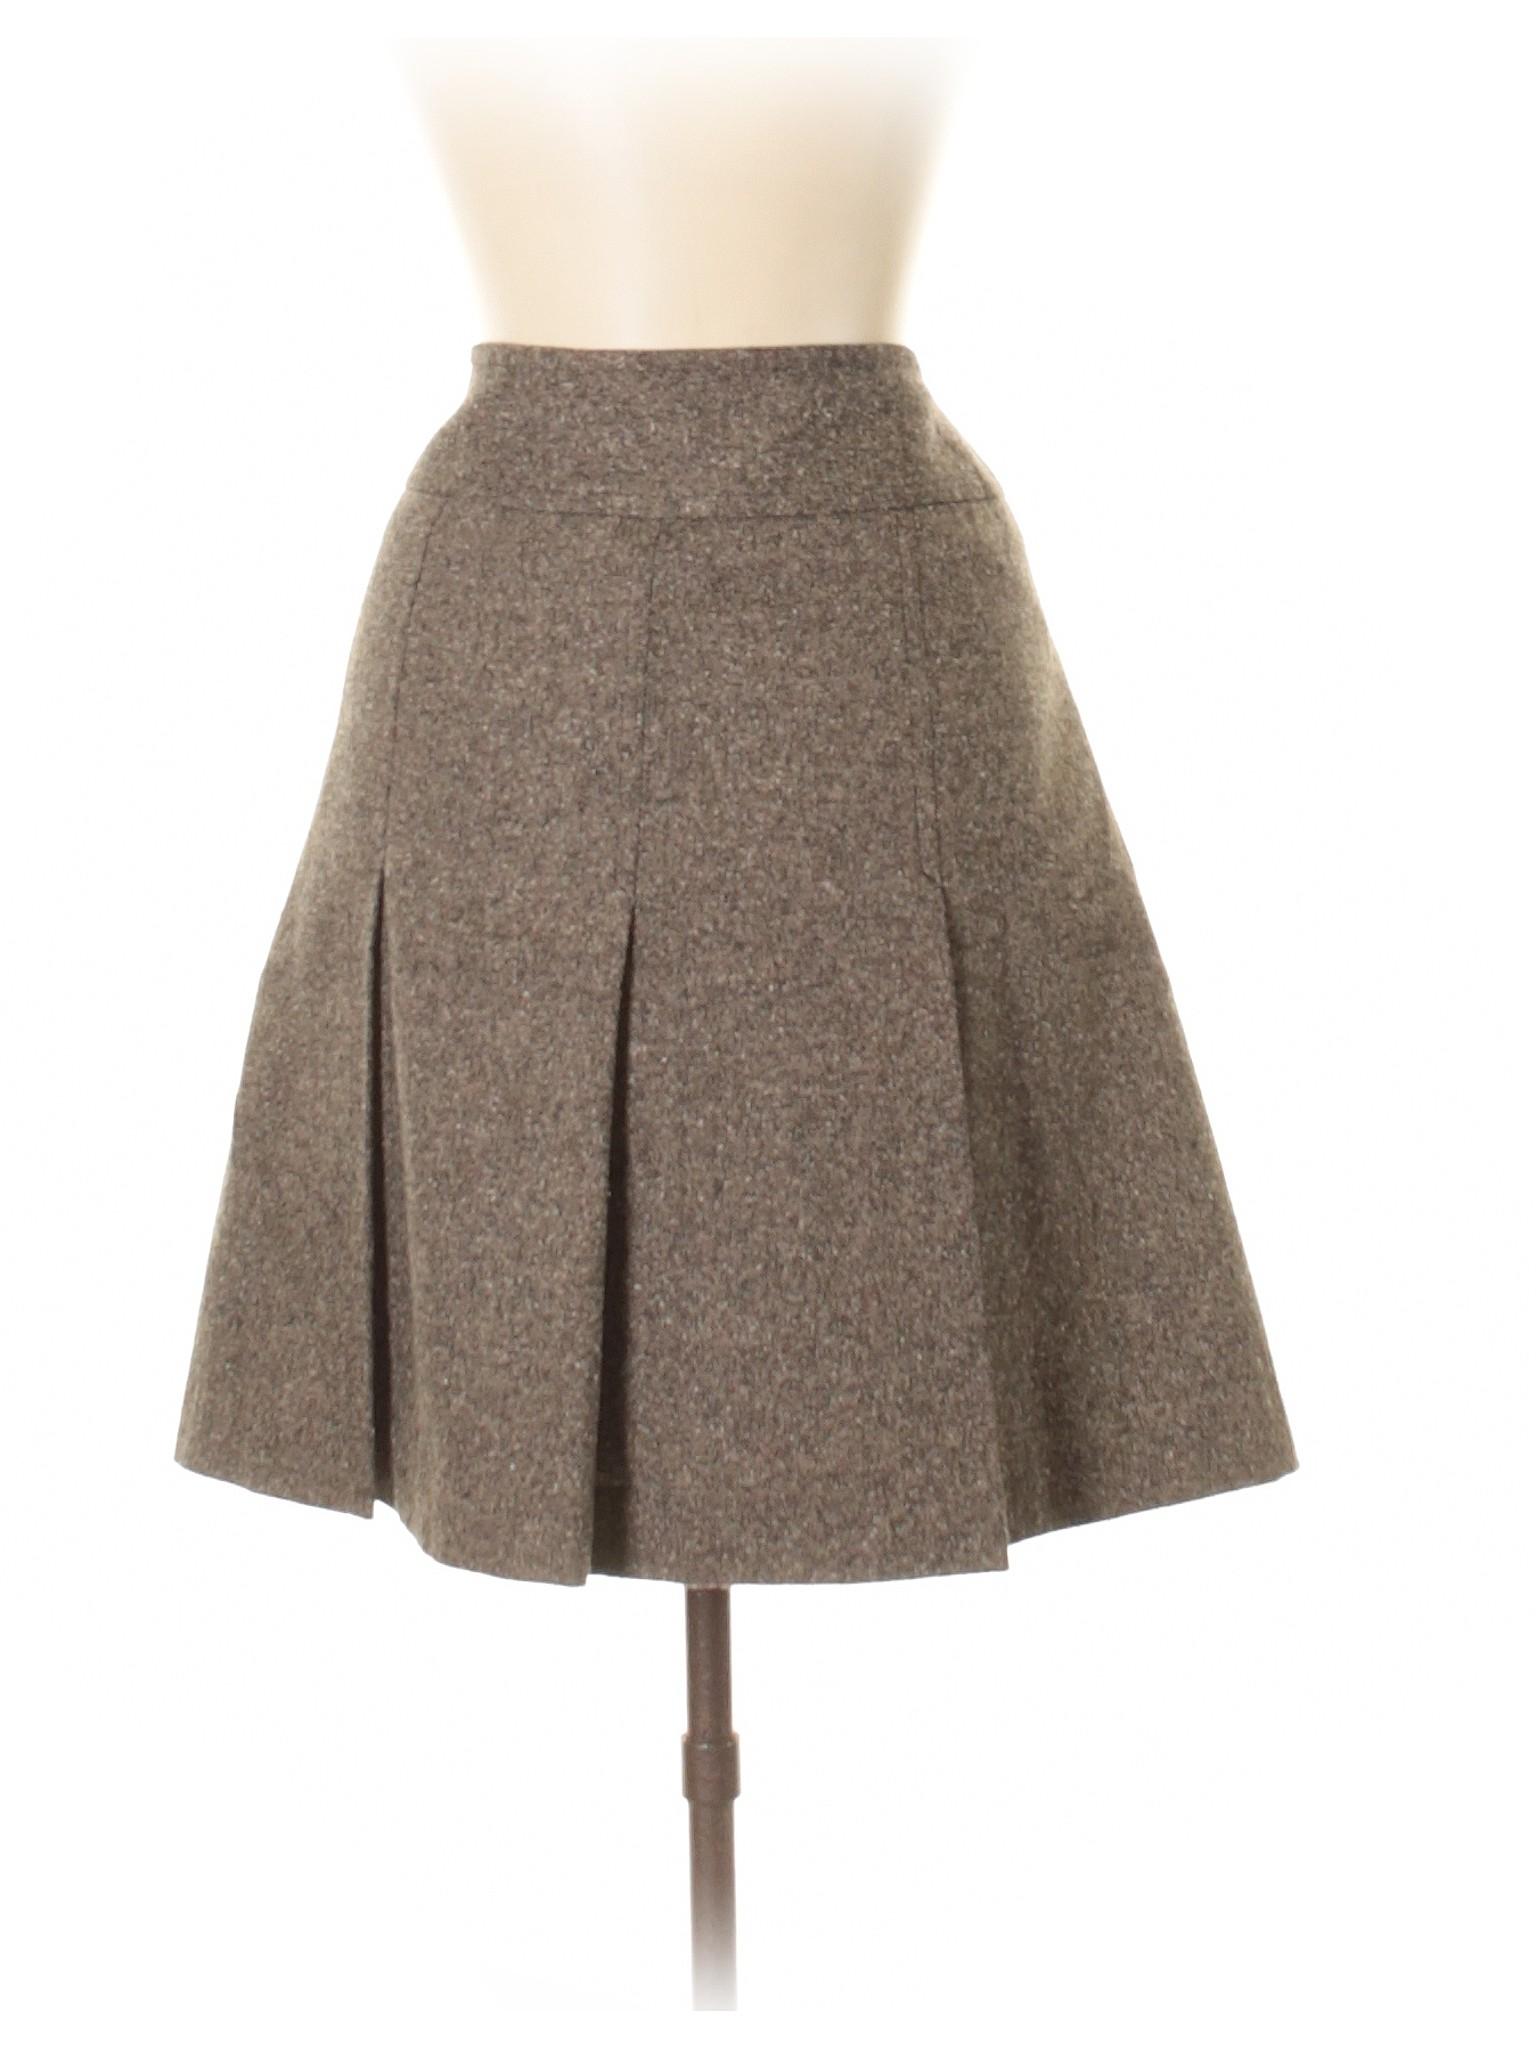 LOFT Skirt Taylor Casual Boutique Ann leisure SqntCt